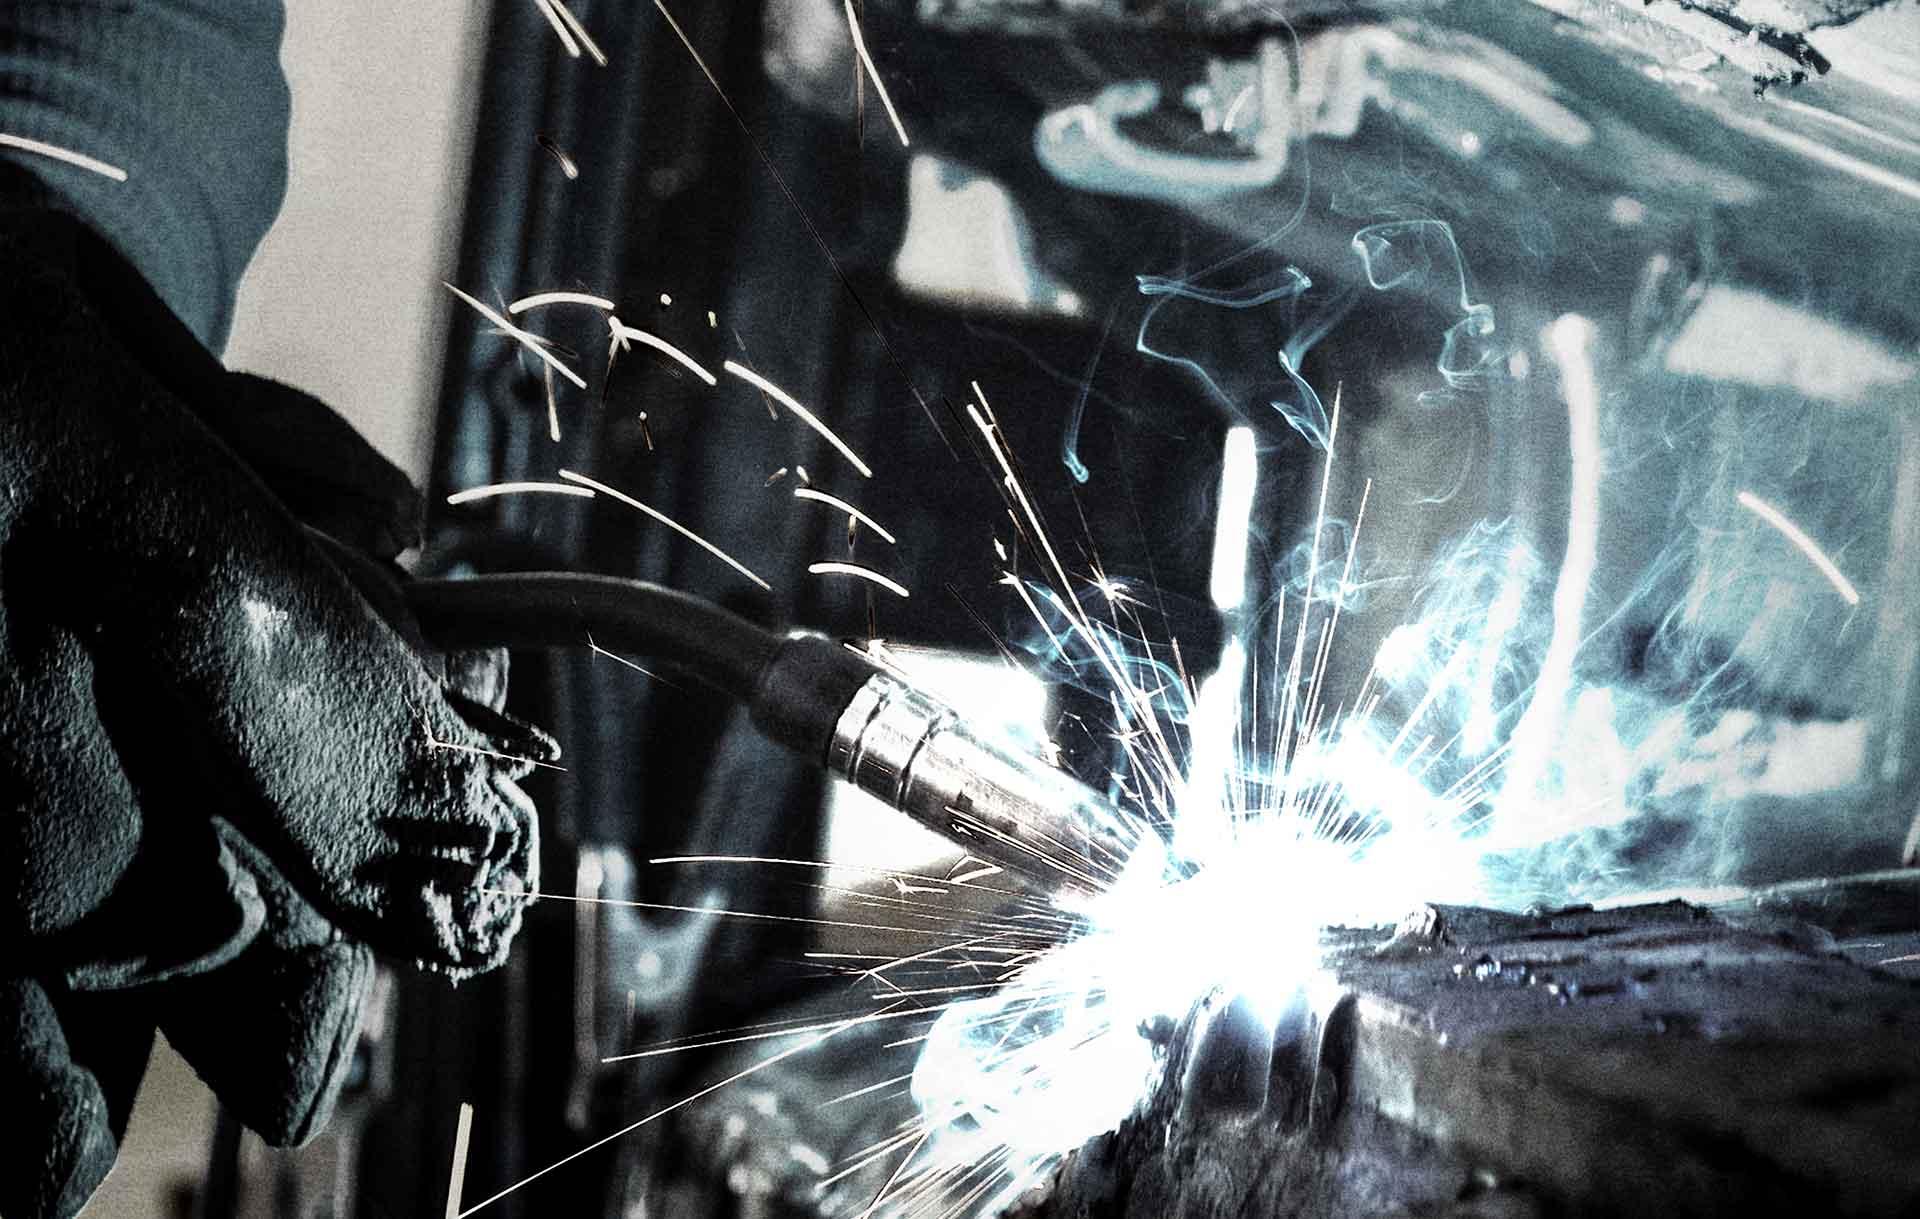 "<h3>Weld on<br>Rock on</h3><p><p>Laikas ist ein Industrieexperte und zuverlässiger partner.<br></p><a class=""front-btn button"" href=""/de/laikas-de/""> Immer bereit </a></p>"